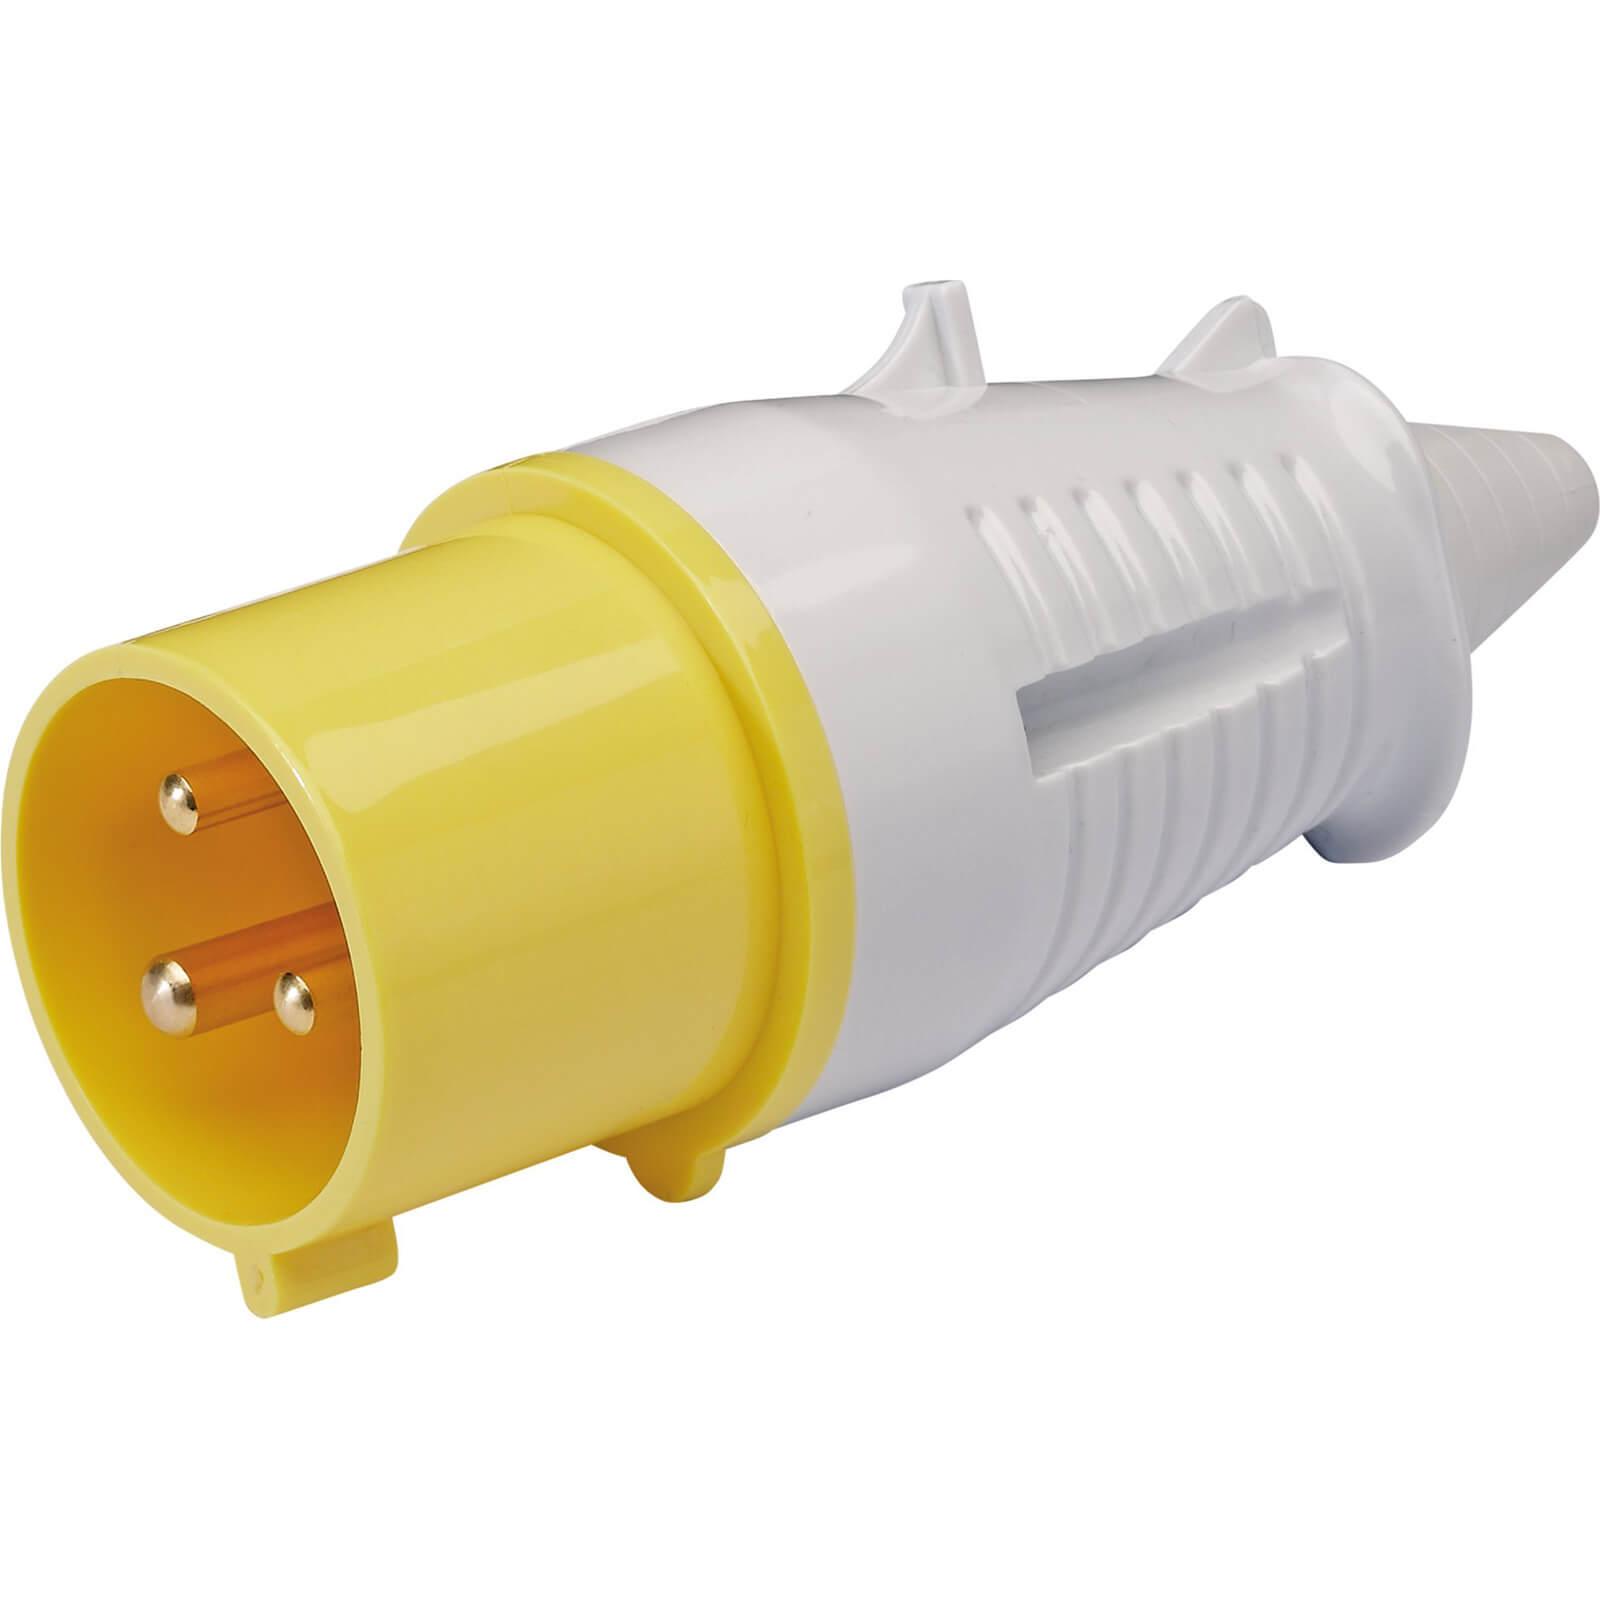 Draper Yellow Plug 32 amp 110v